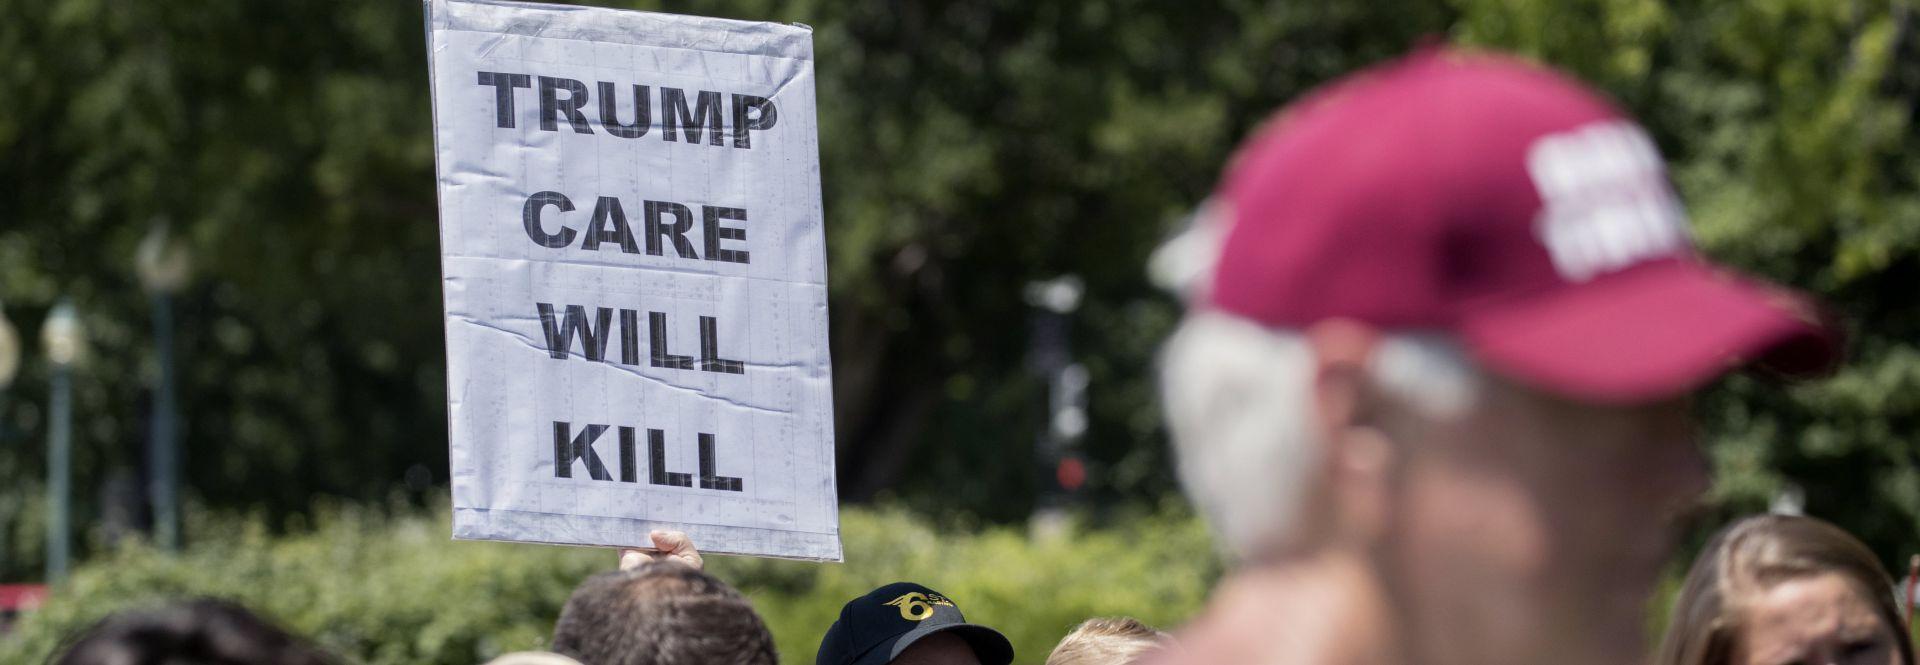 Republican healthcare plan: a death sentence for Latinos